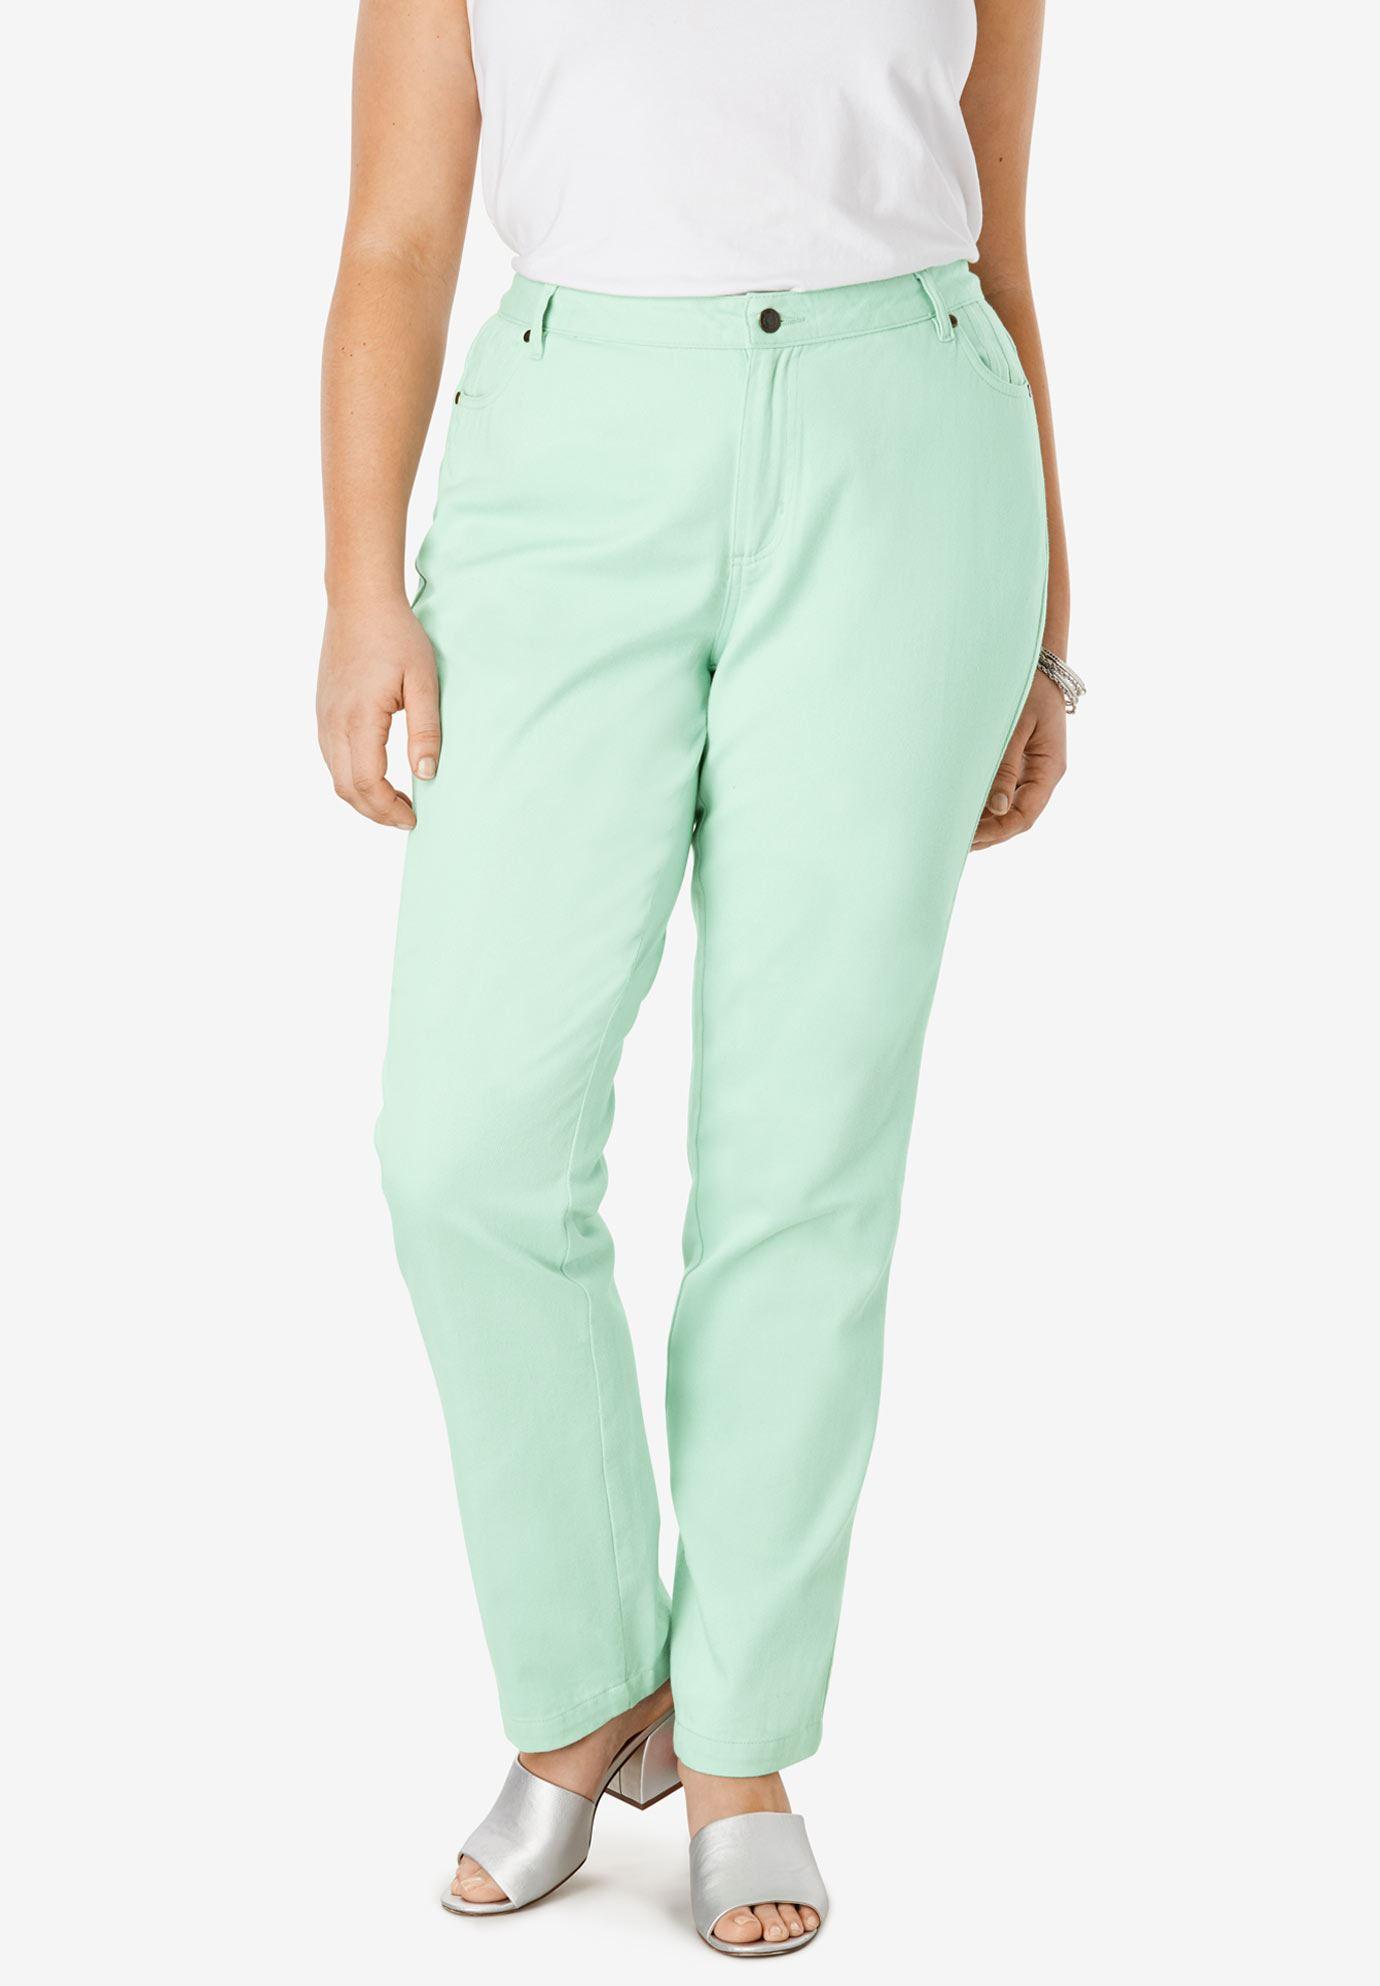 4187f595c36 Classic Cotton Denim Straight Jeans